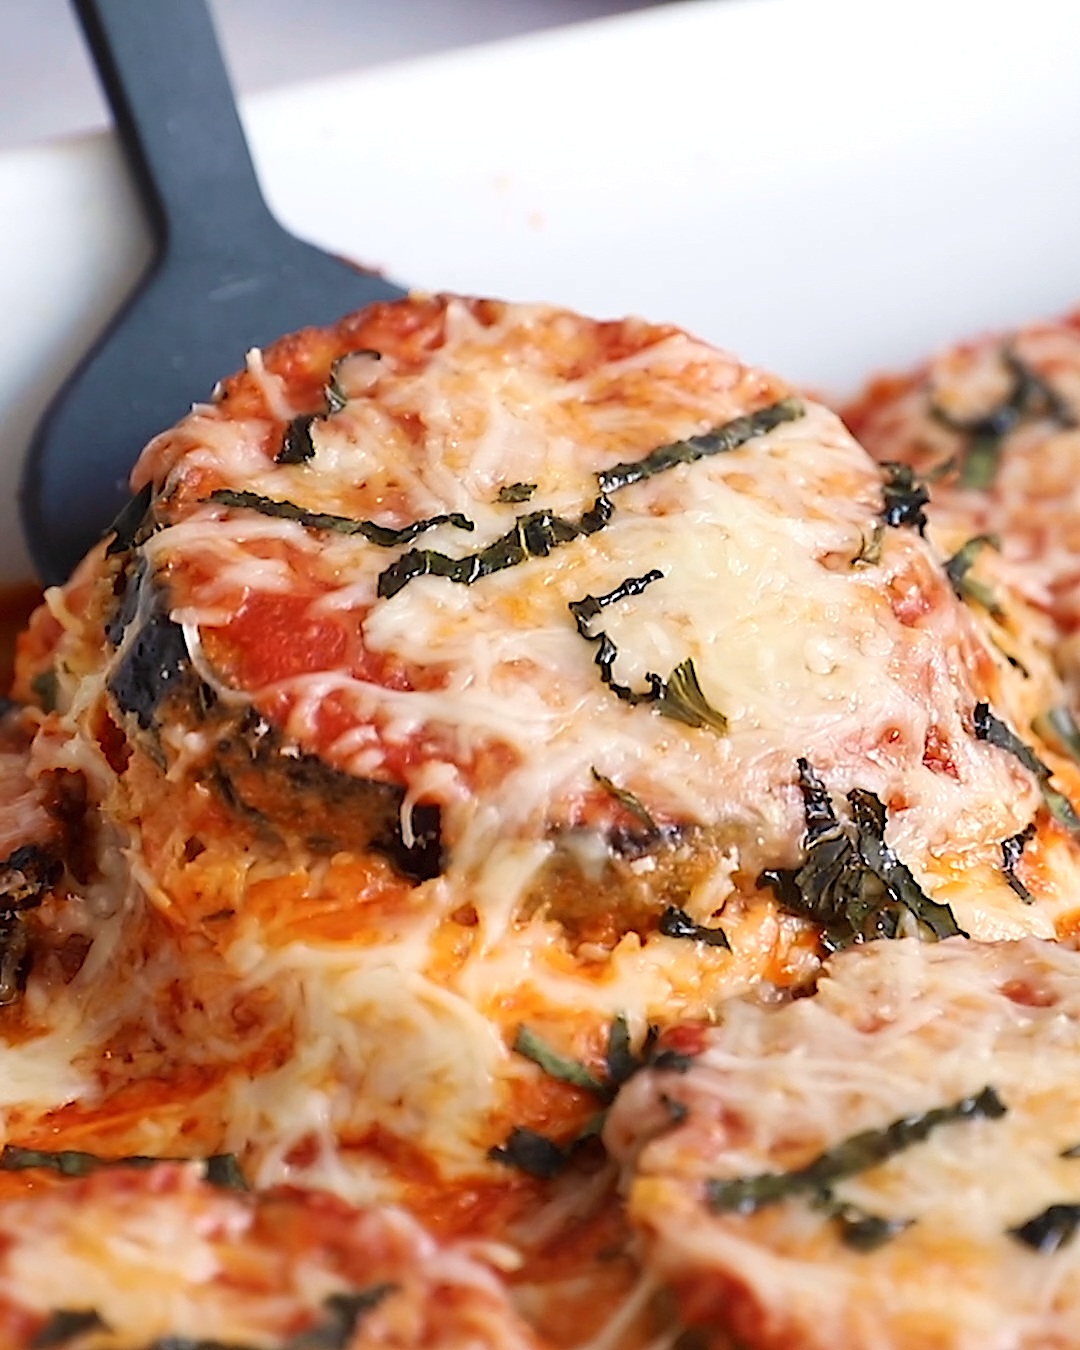 Healthy Baked Eggplant Parmesan | Eating Bird Food